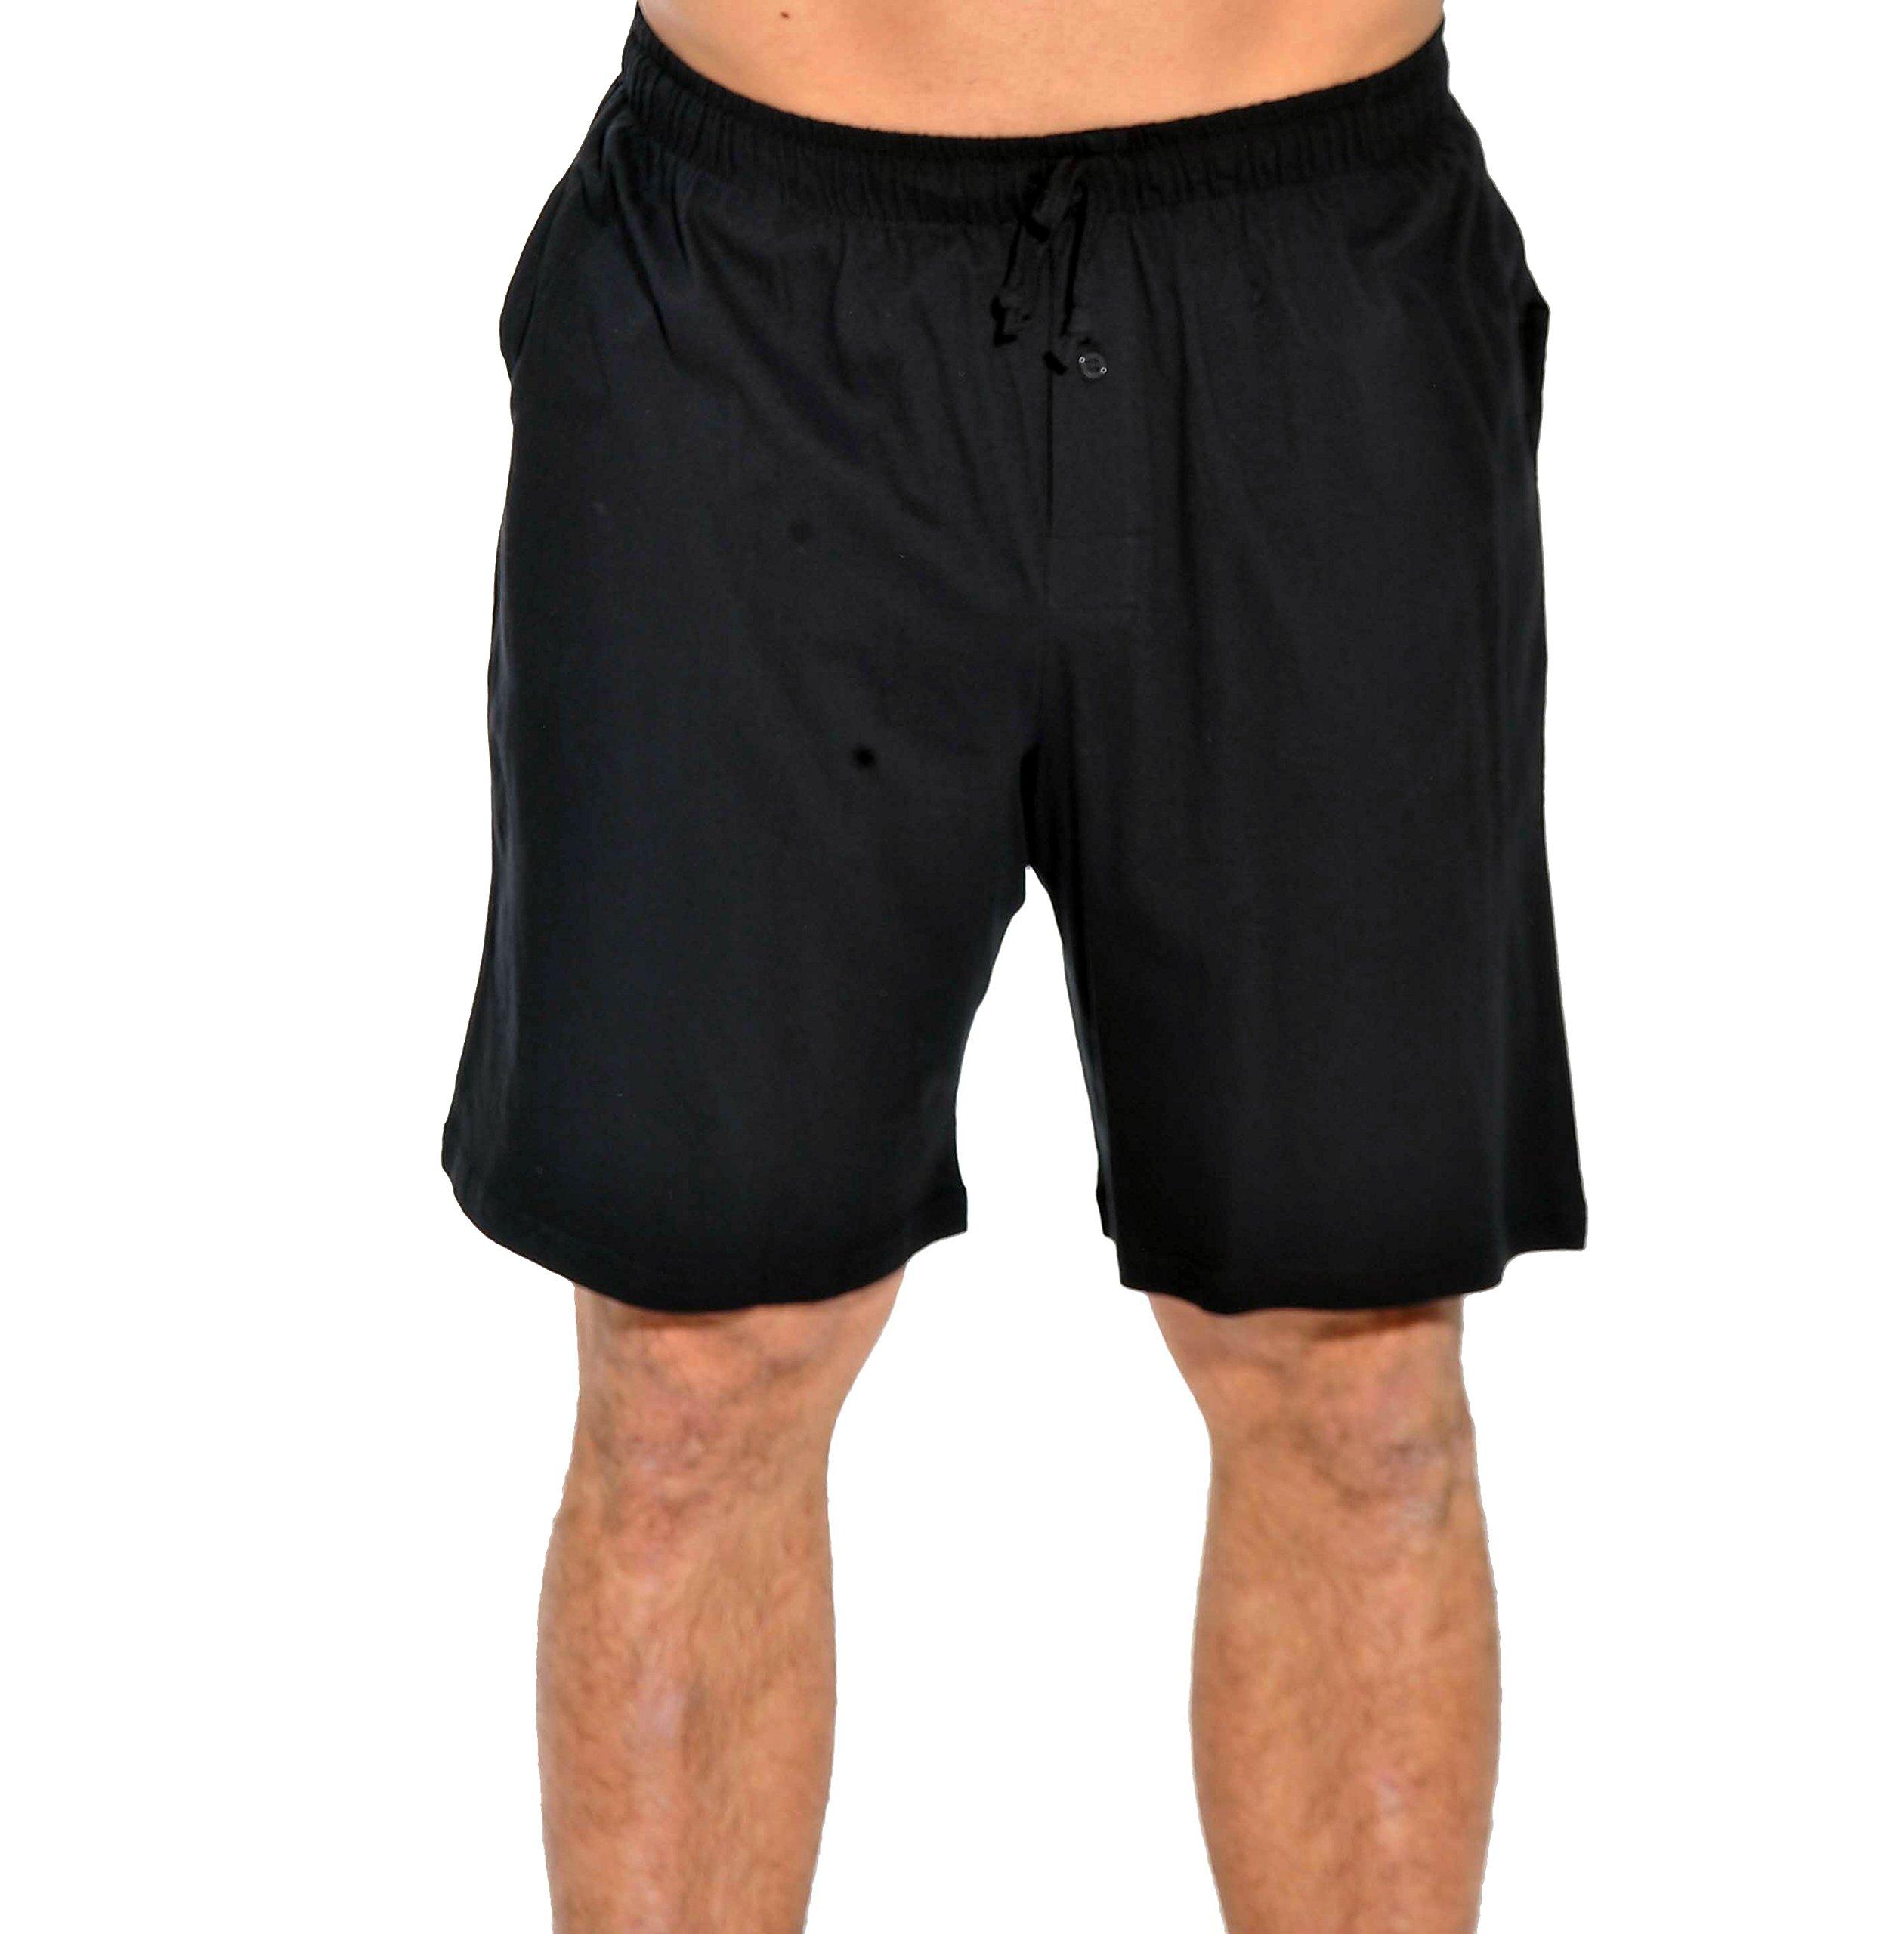 14501-Black-XXL At the Buzzer Men's Pajama Shorts / Sleepwear / PJs,Black,XX-Large